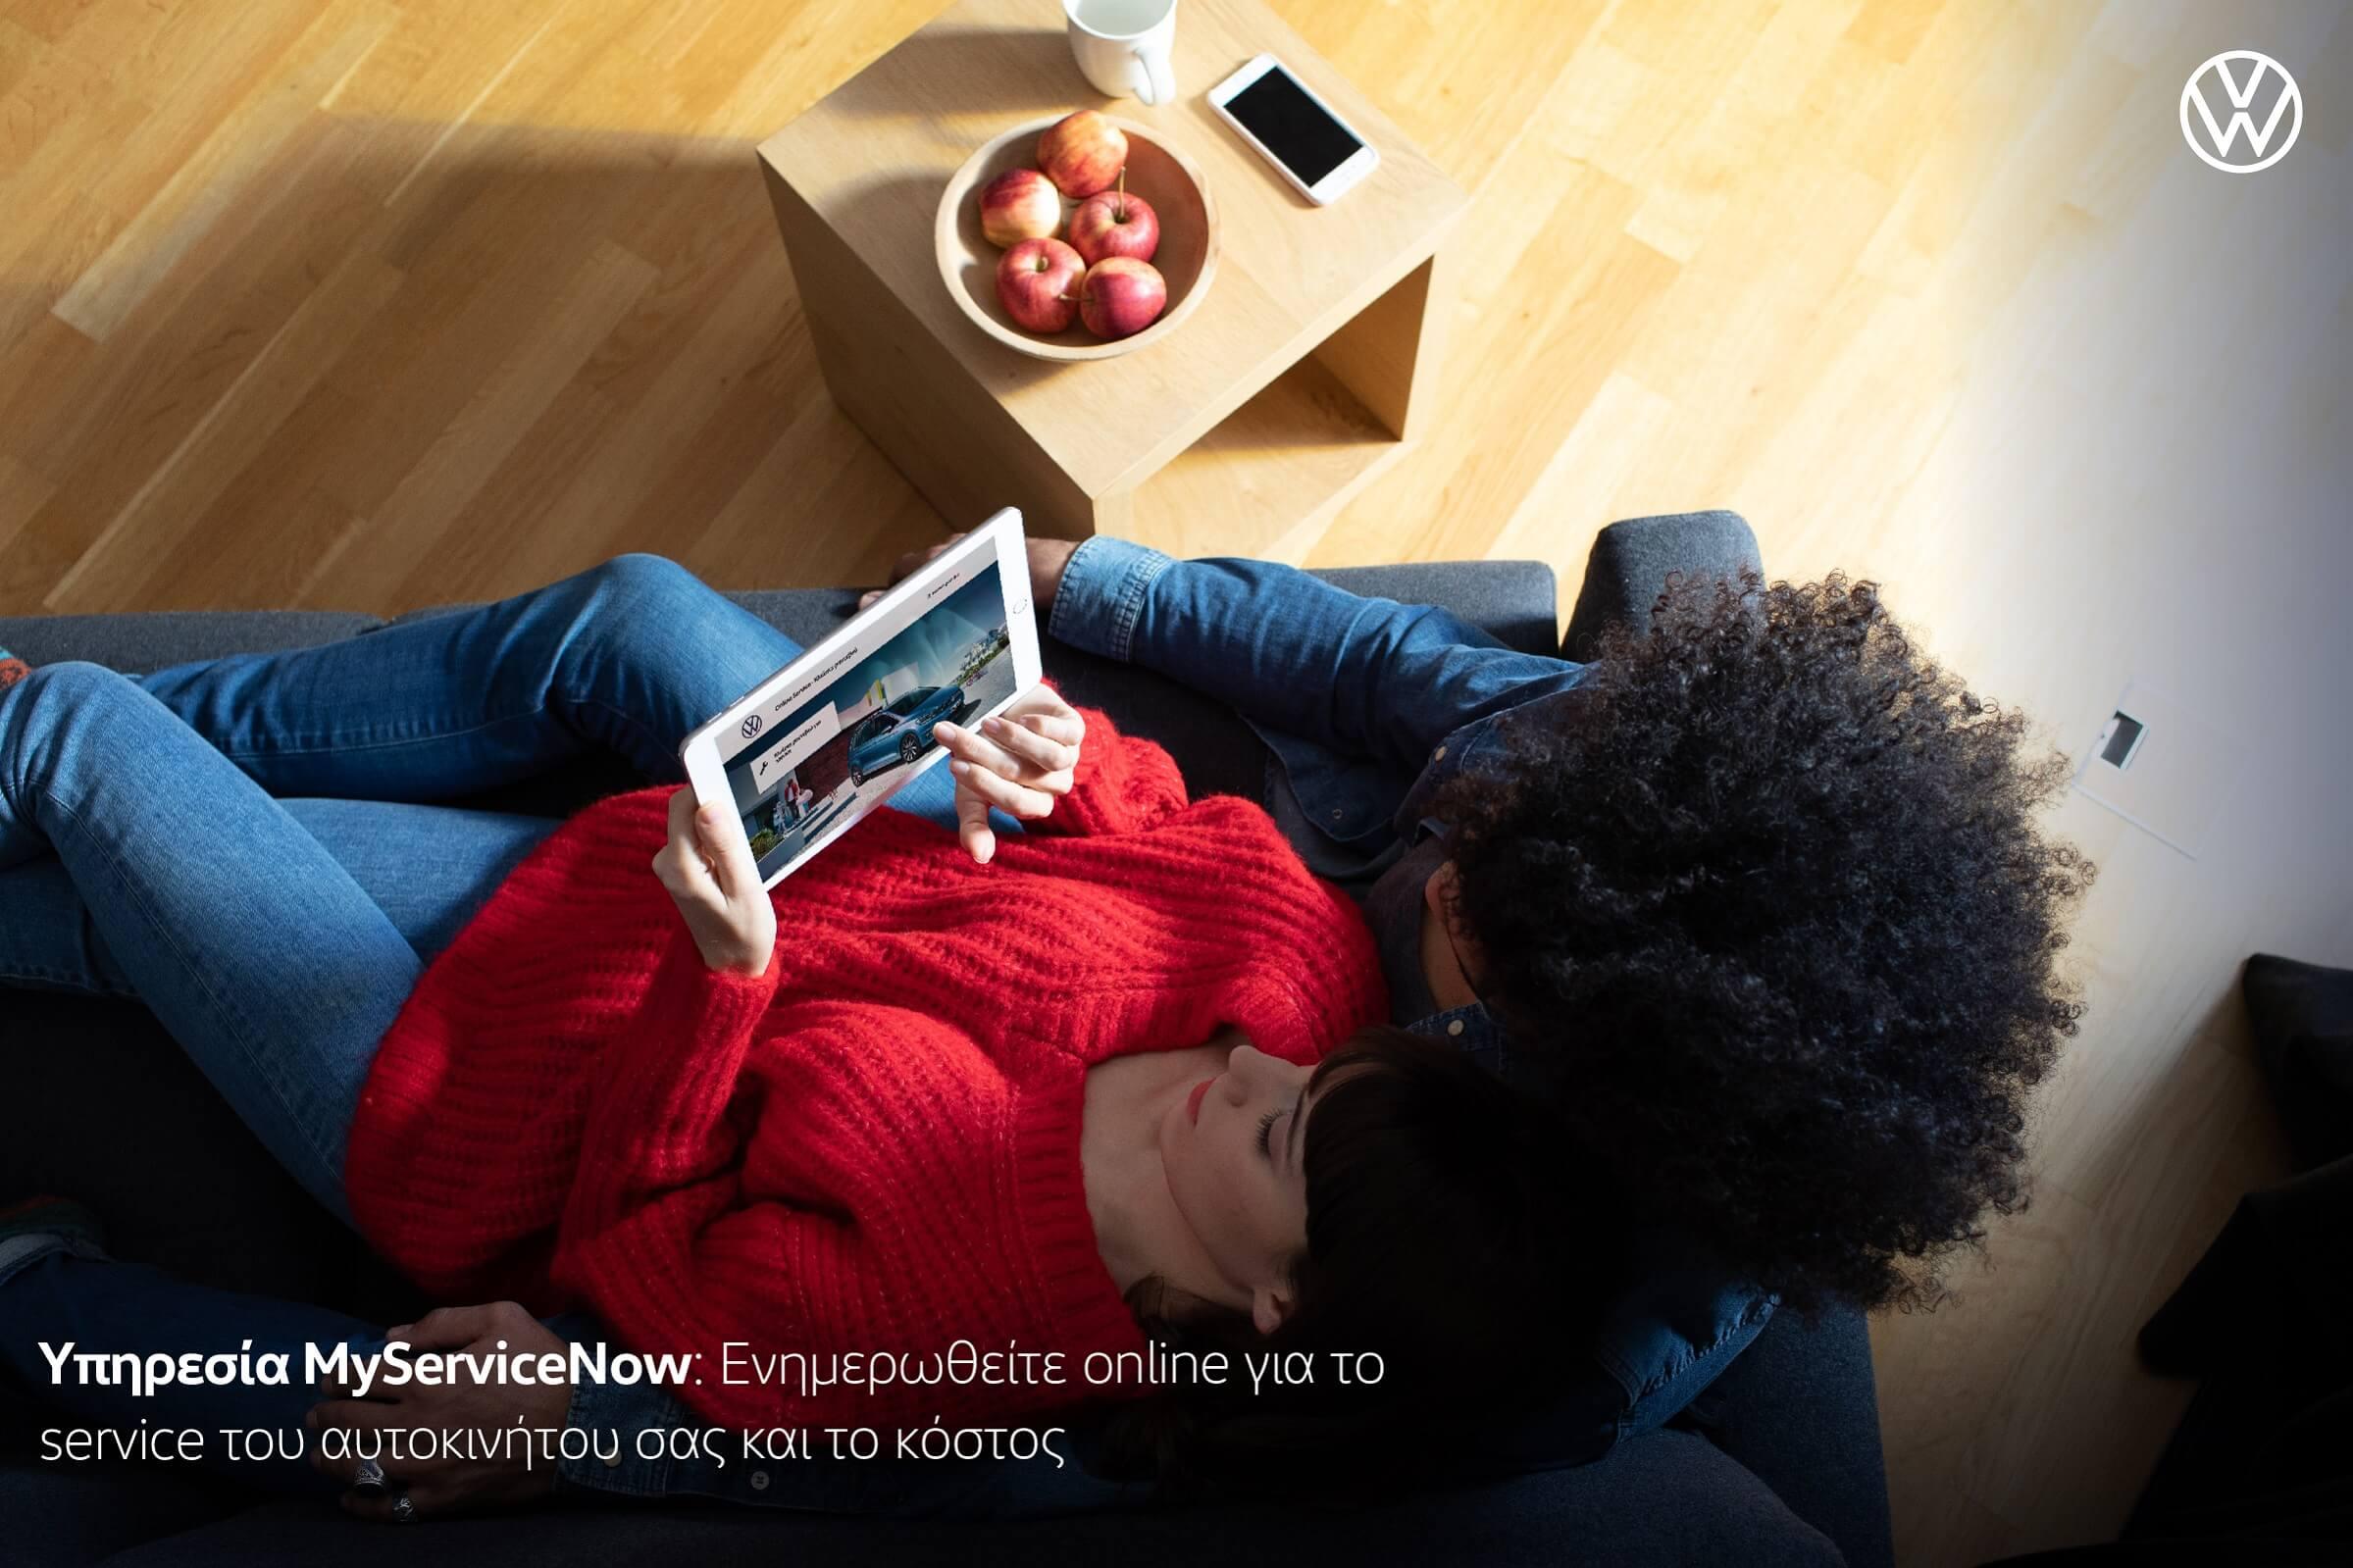 Volkswagen After Sales - Υπηρεσία MyServiceNow - Ραντεβού για service και ενημέρωση για το κόστος του online